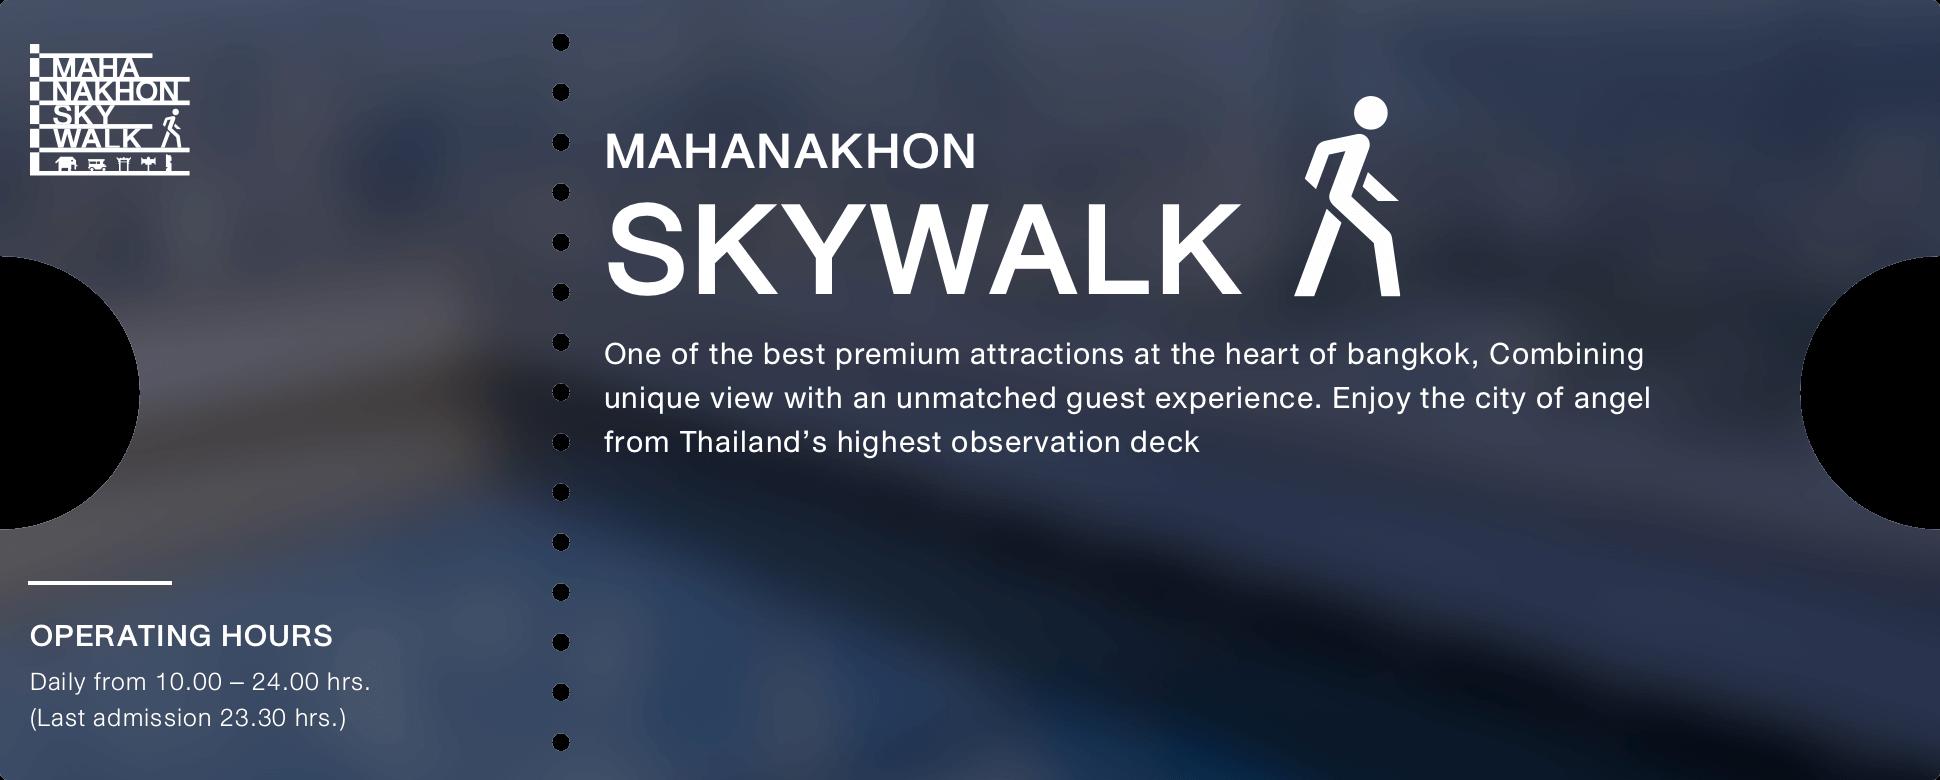 Mahanakhon Skywalk information